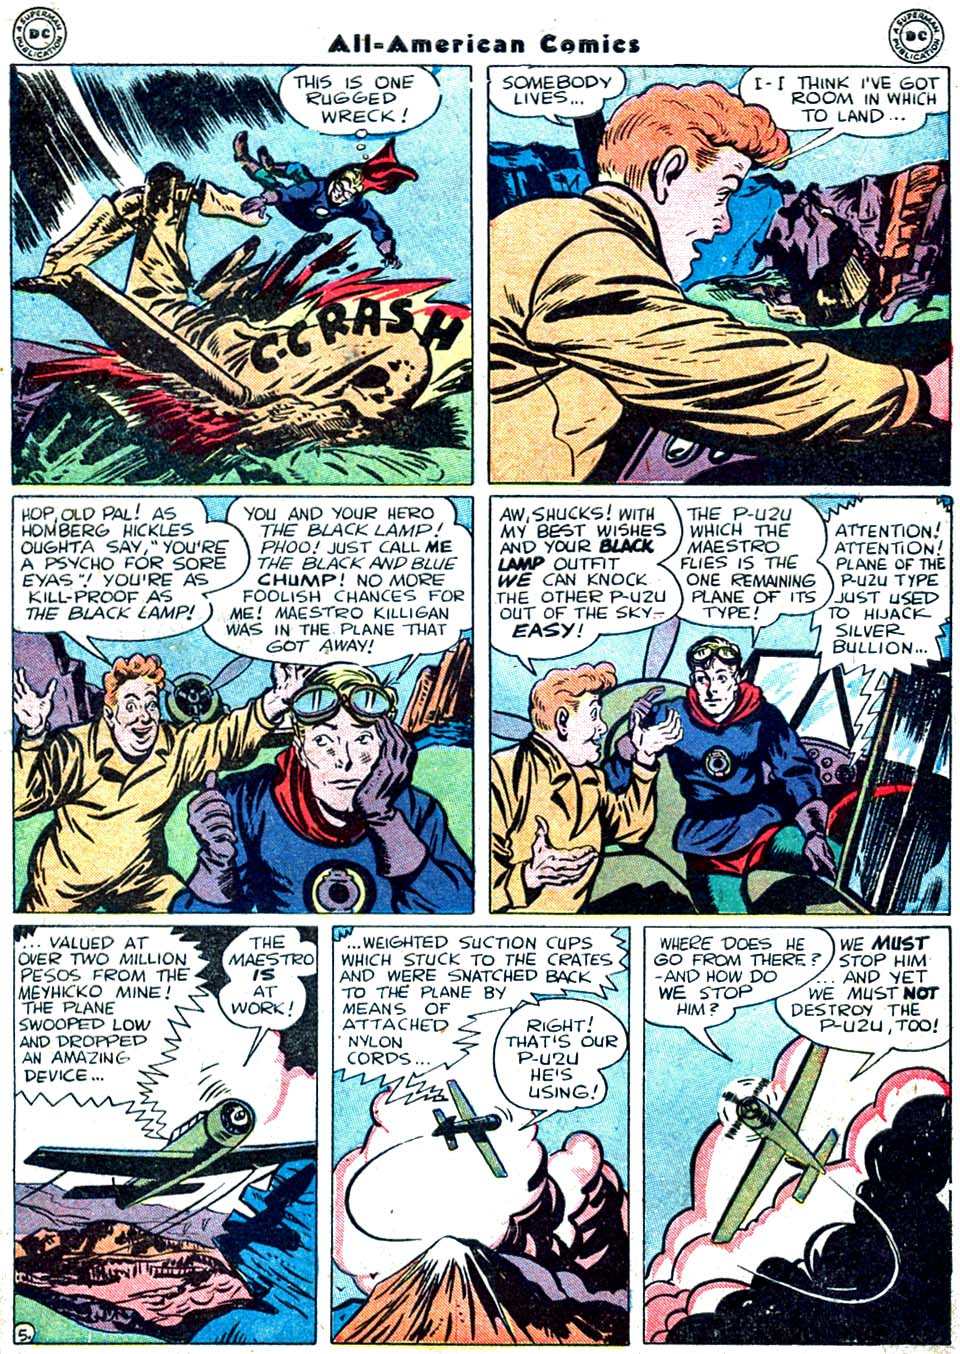 Read online All-American Comics (1939) comic -  Issue #78 - 45